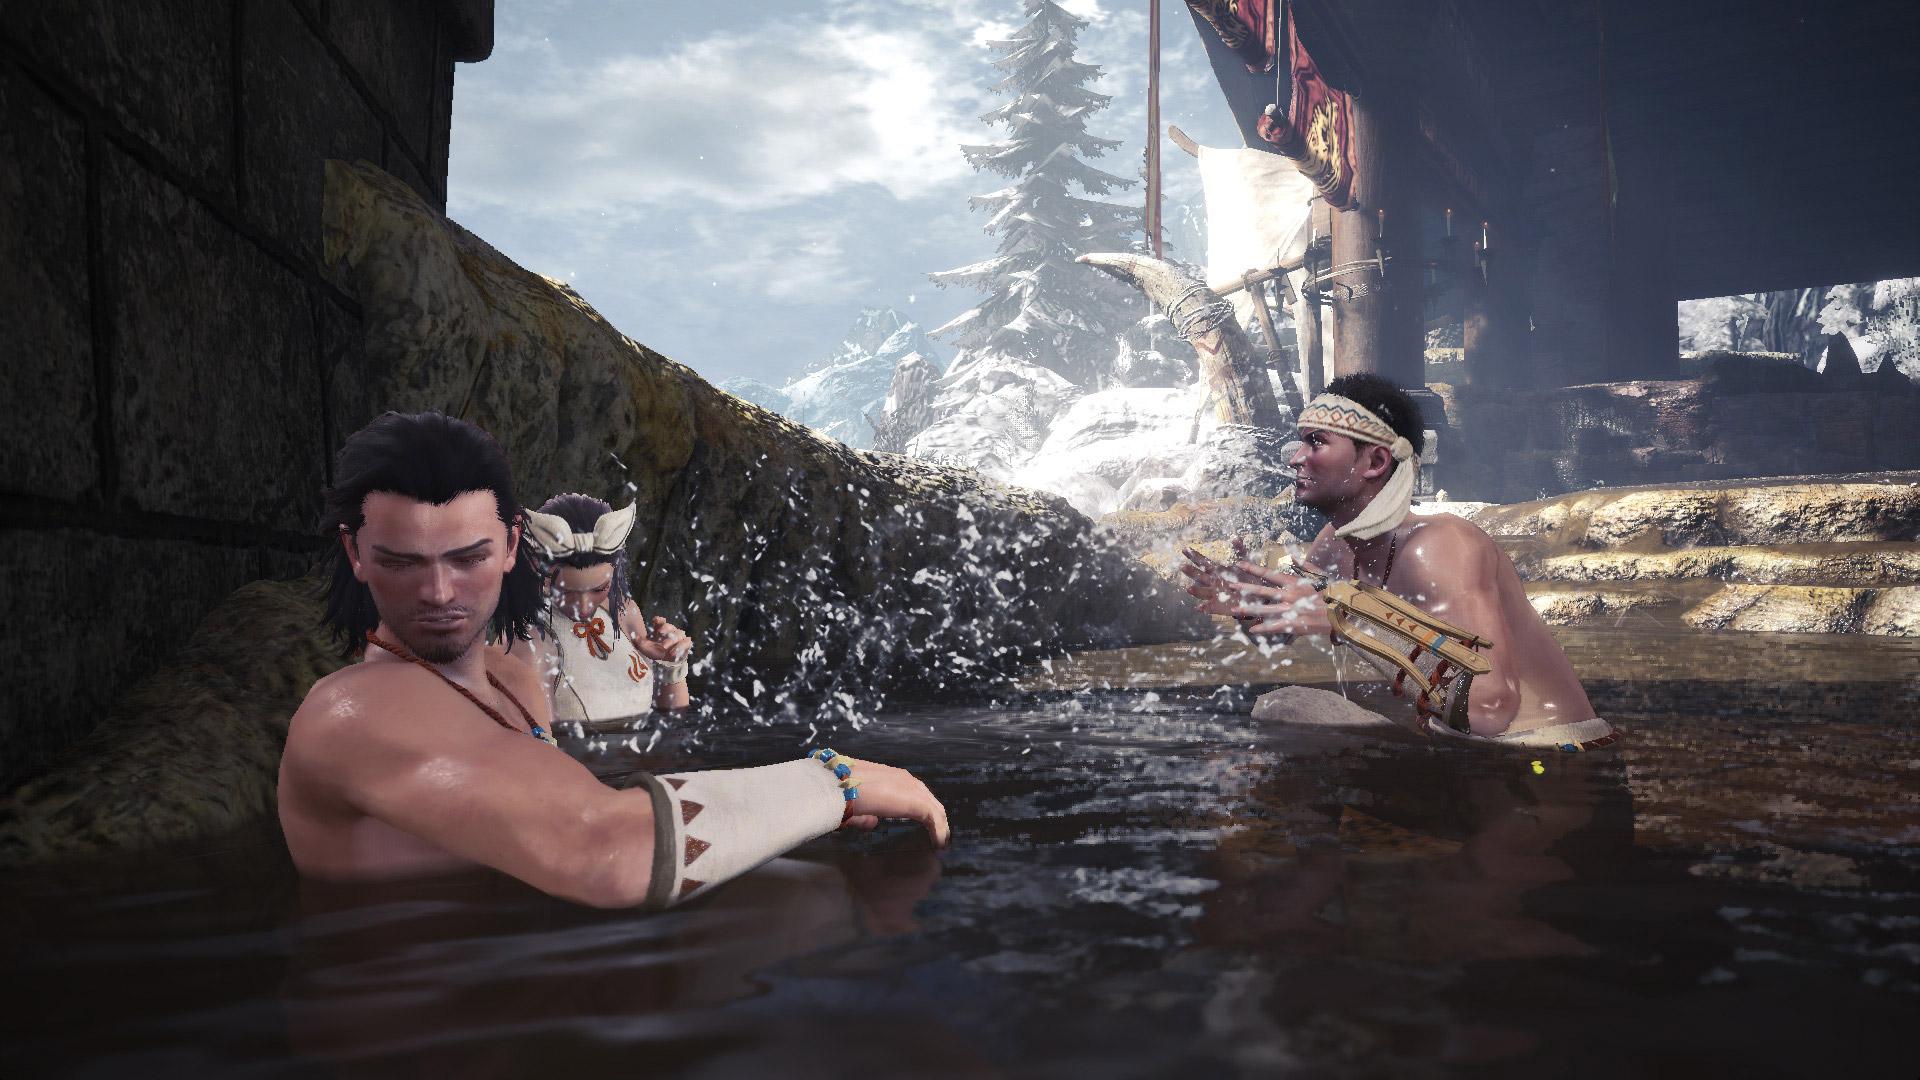 Monster Hunter World: Iceborne's PC release date is January 2020